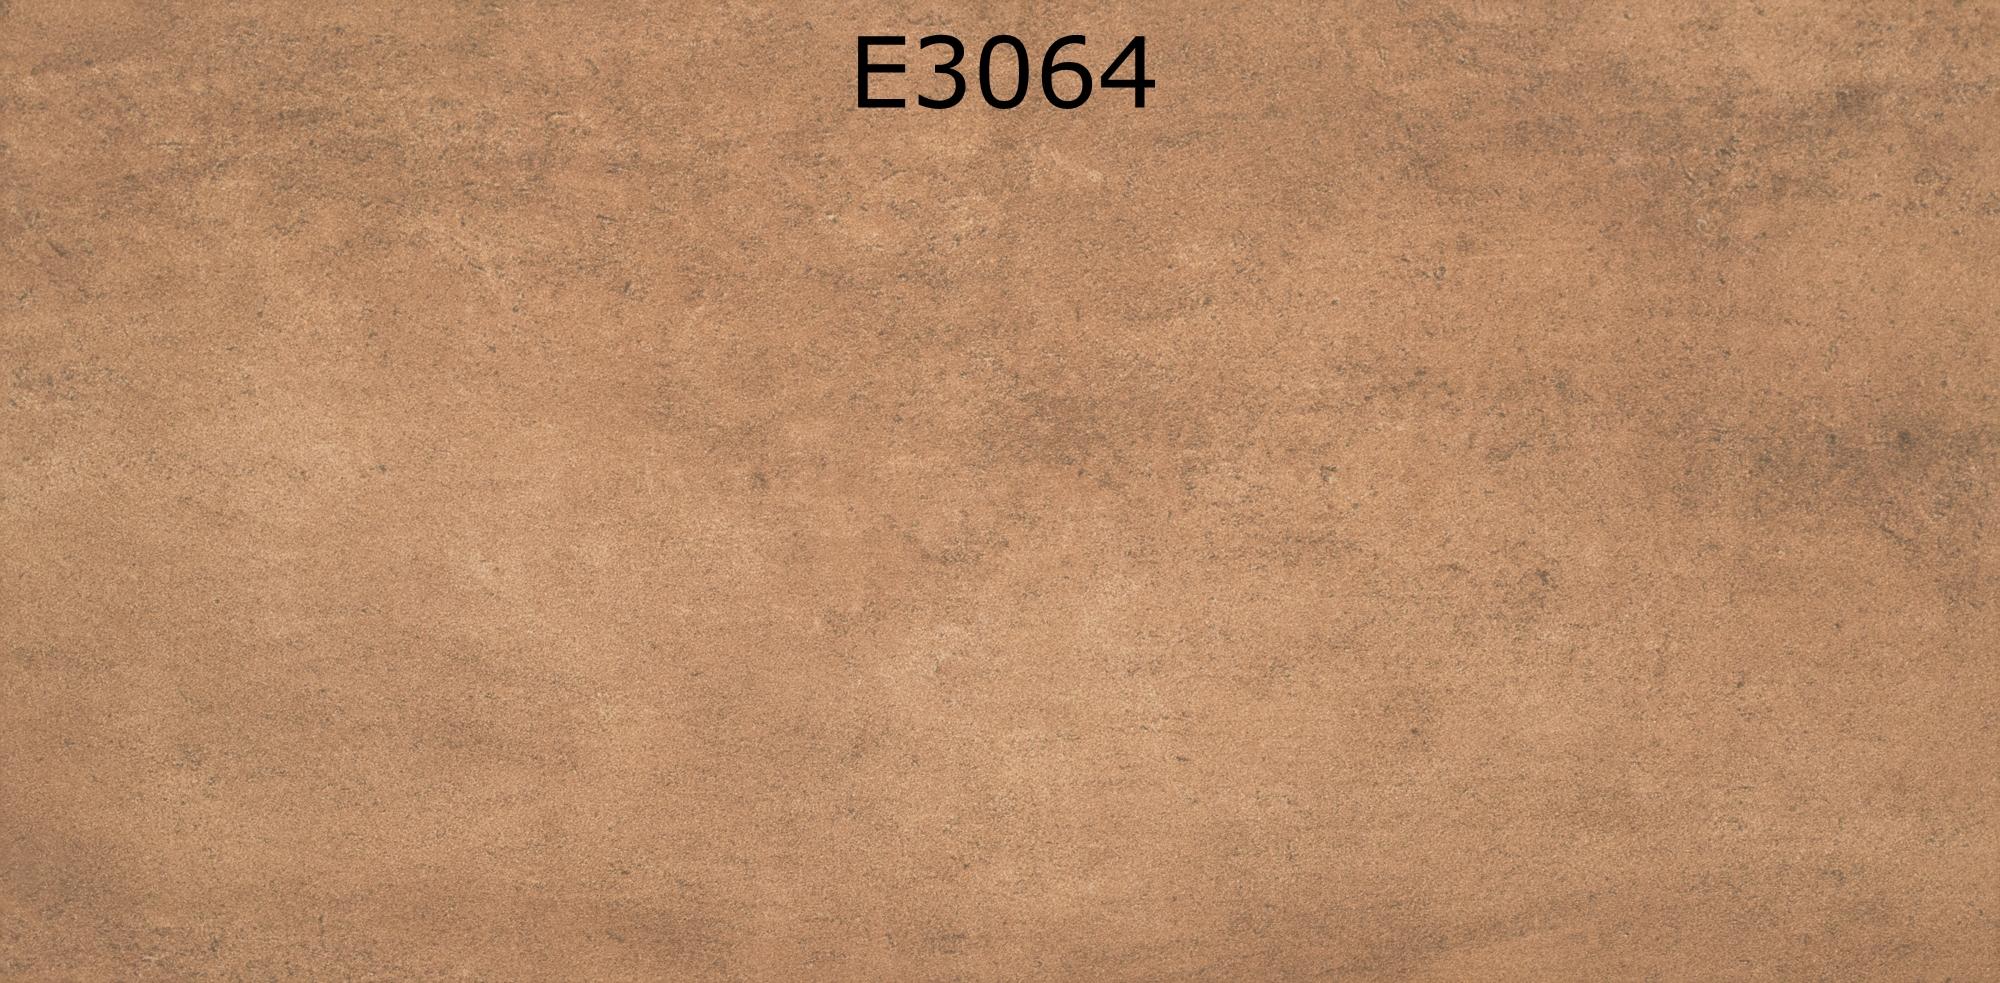 E3064